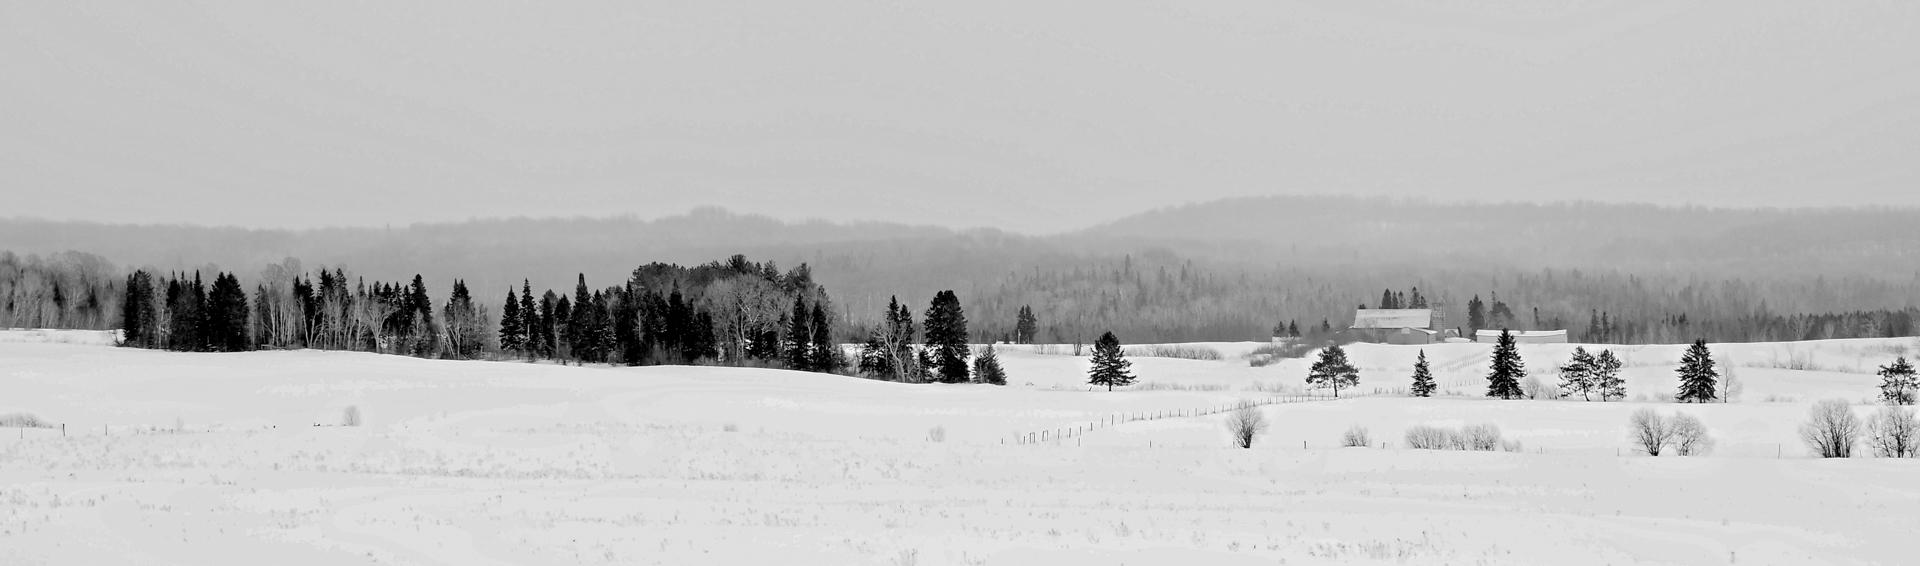 Northern Winterscape